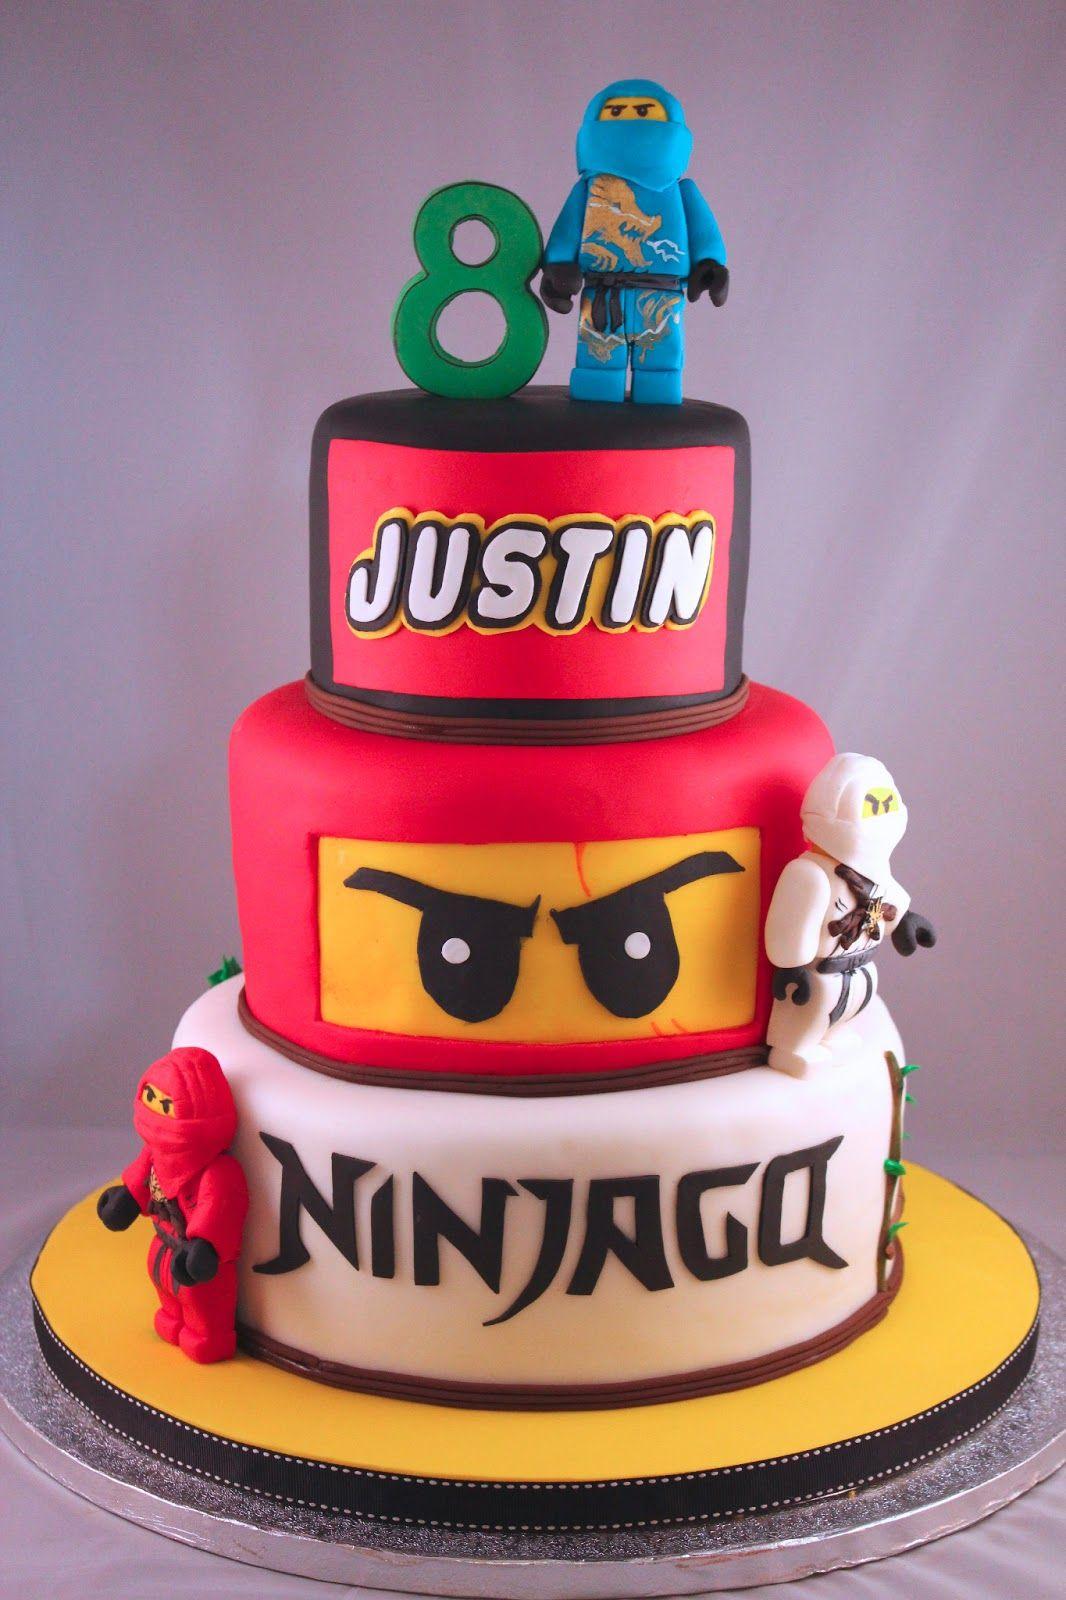 Ninjago Fondant Cakes